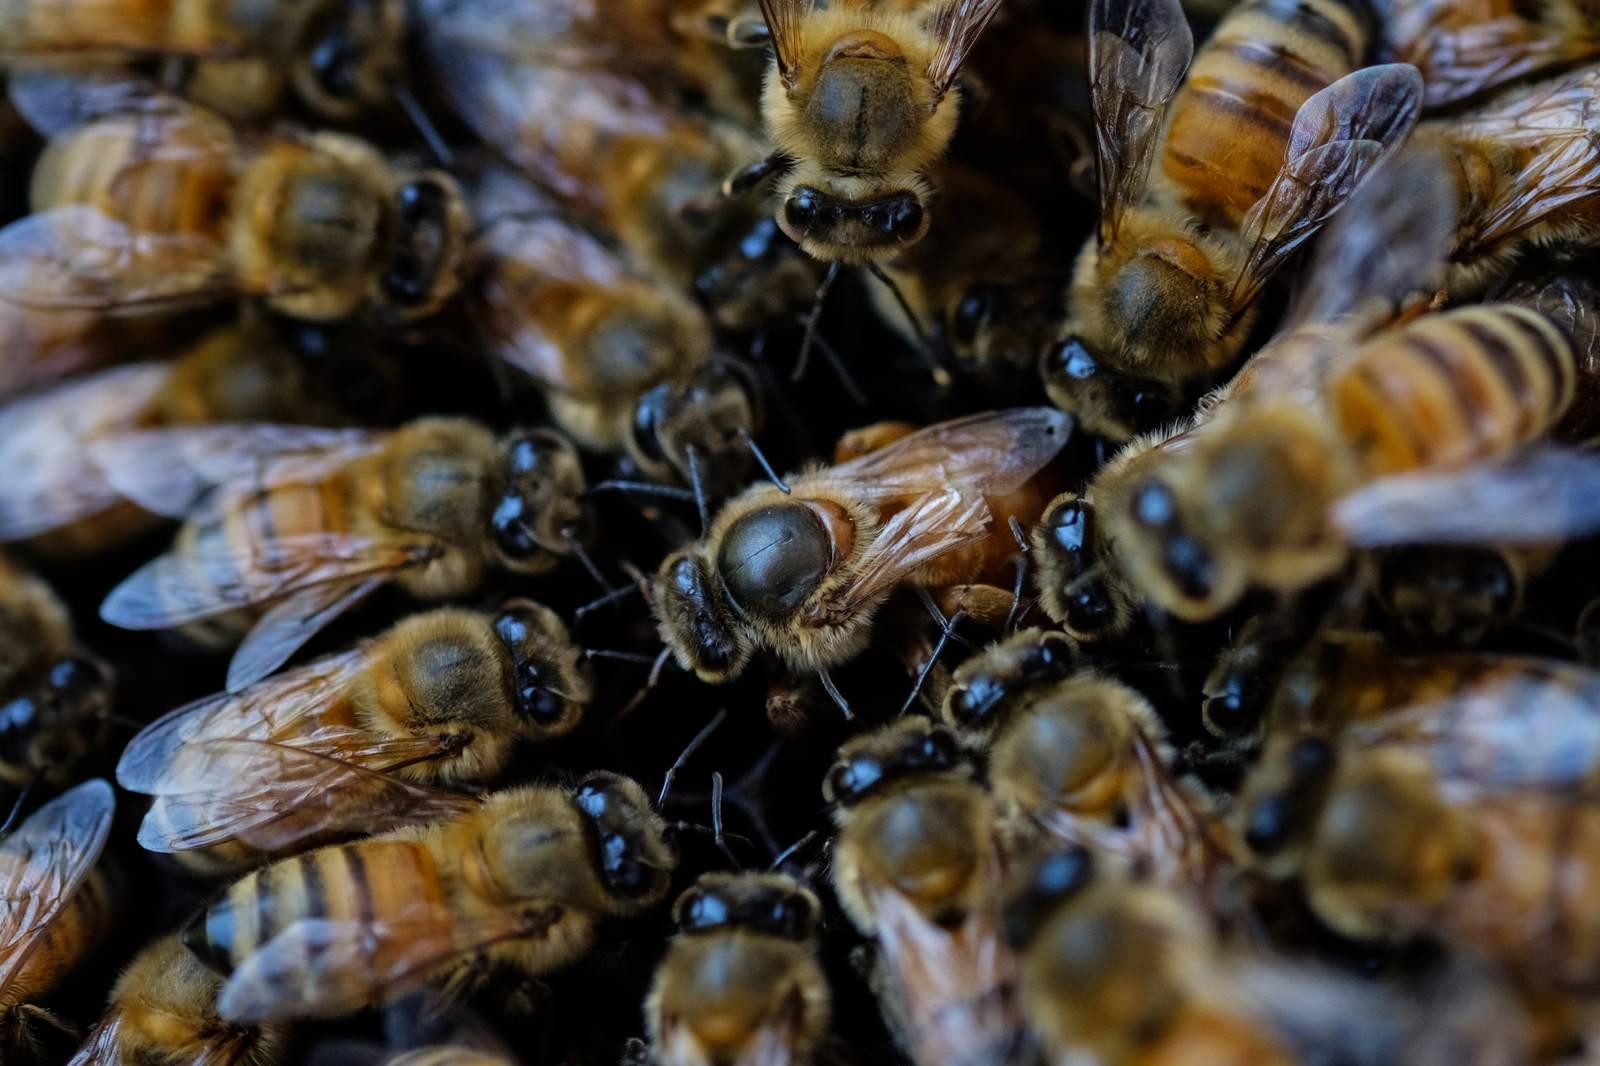 「産卵中の女王蜂(中央)」の写真